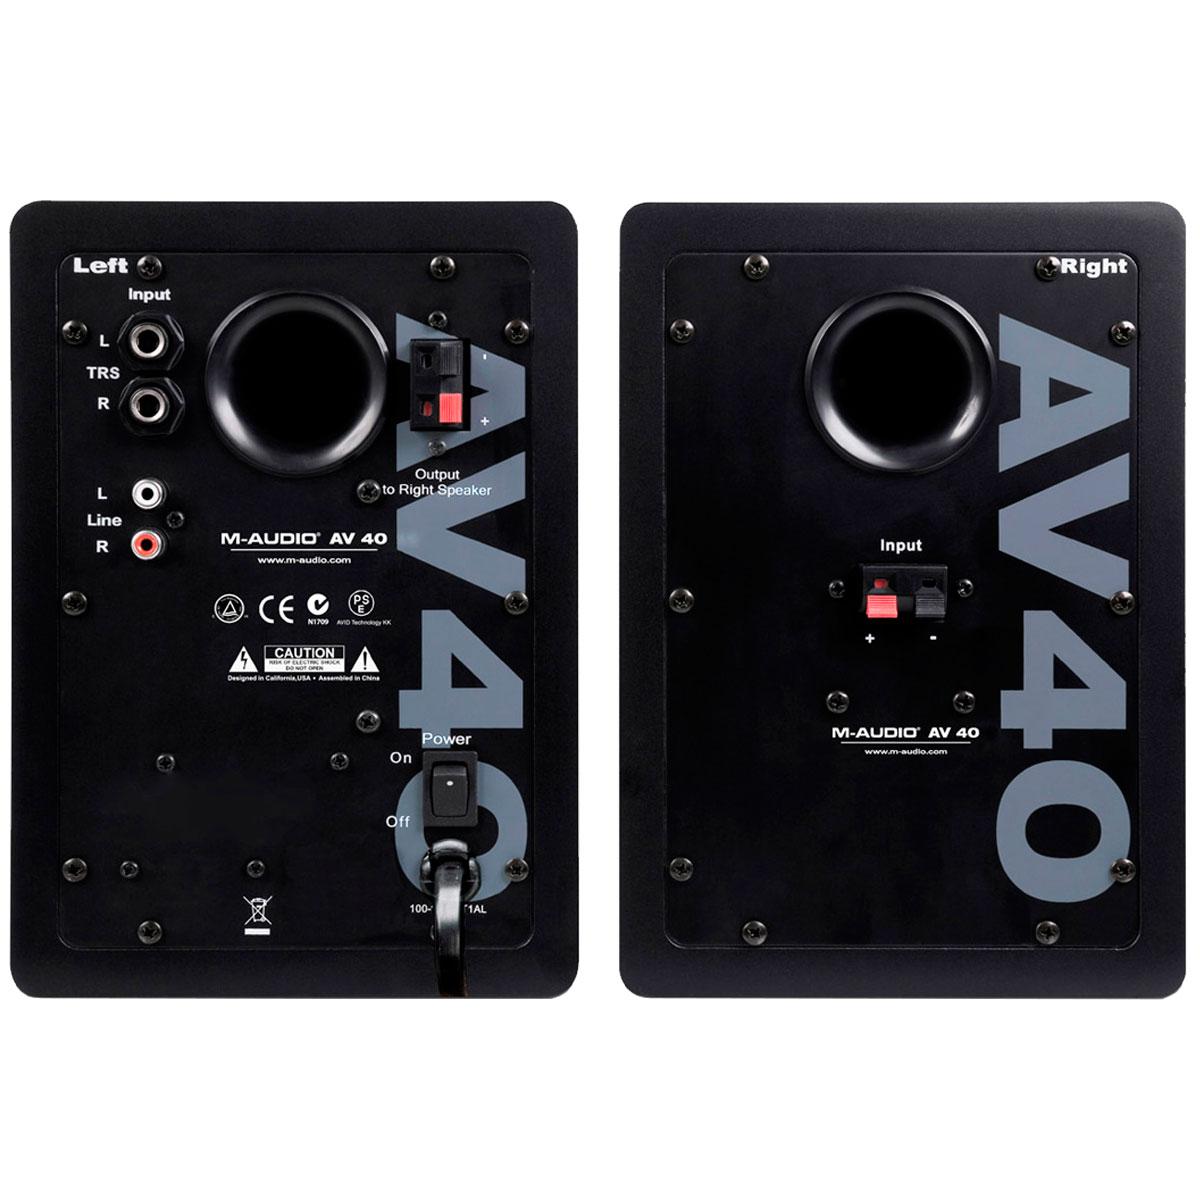 Monitor de Referência Ativo Fal 4 Pol 20W (Par) - Studiophile AV 40 M-Audio